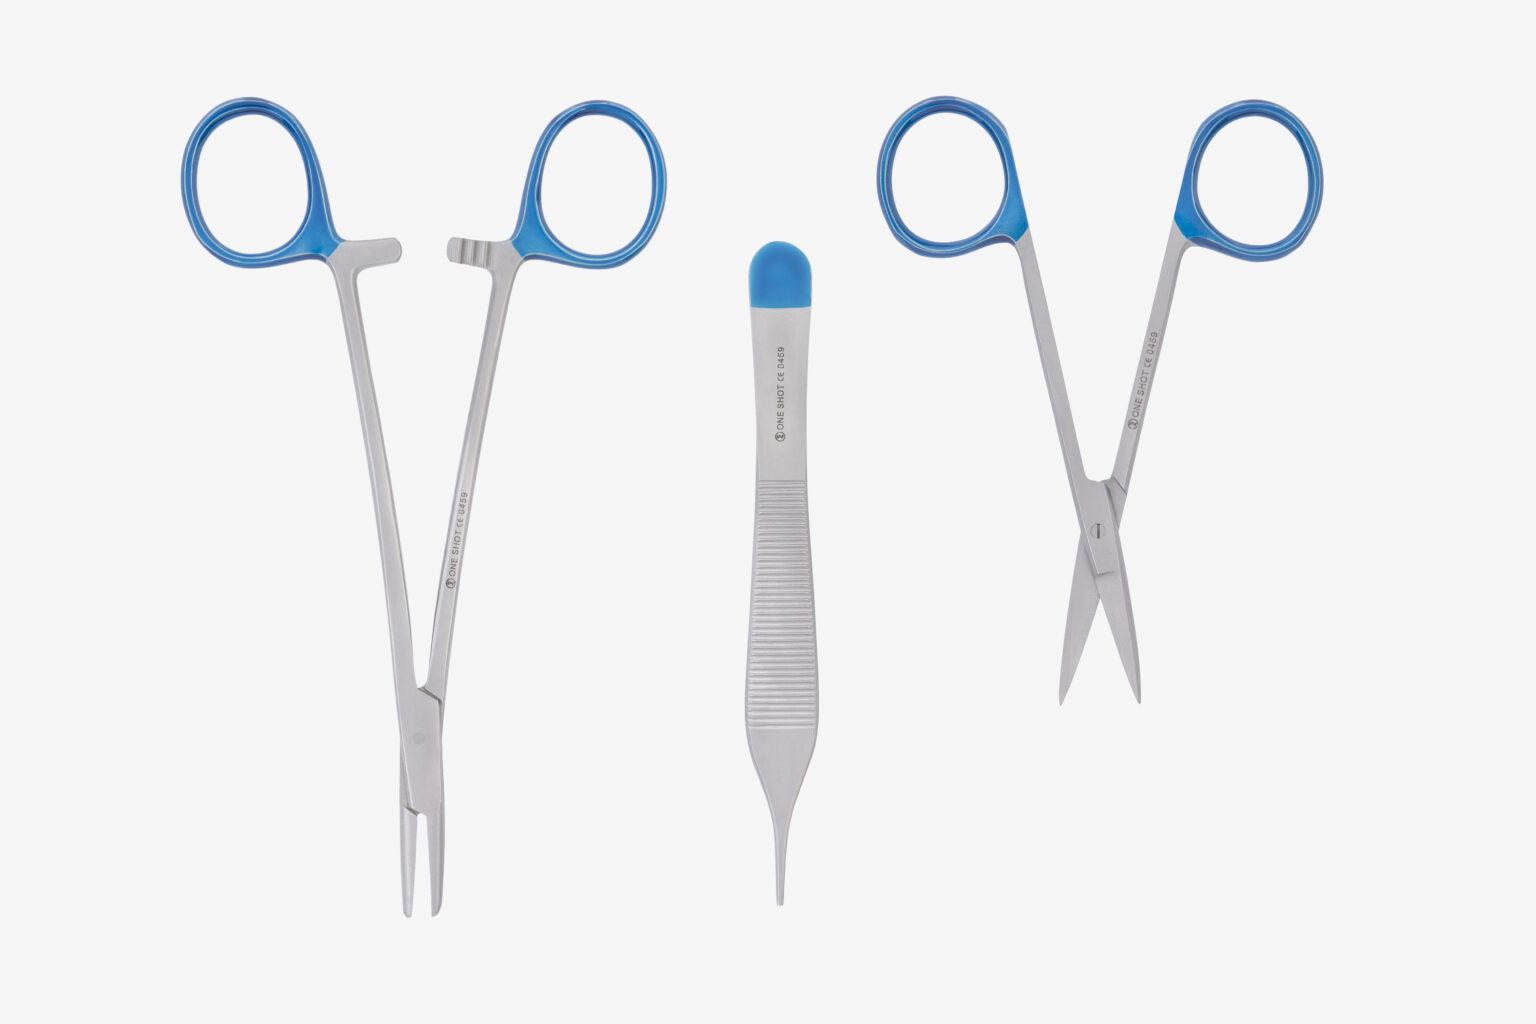 Set de suture